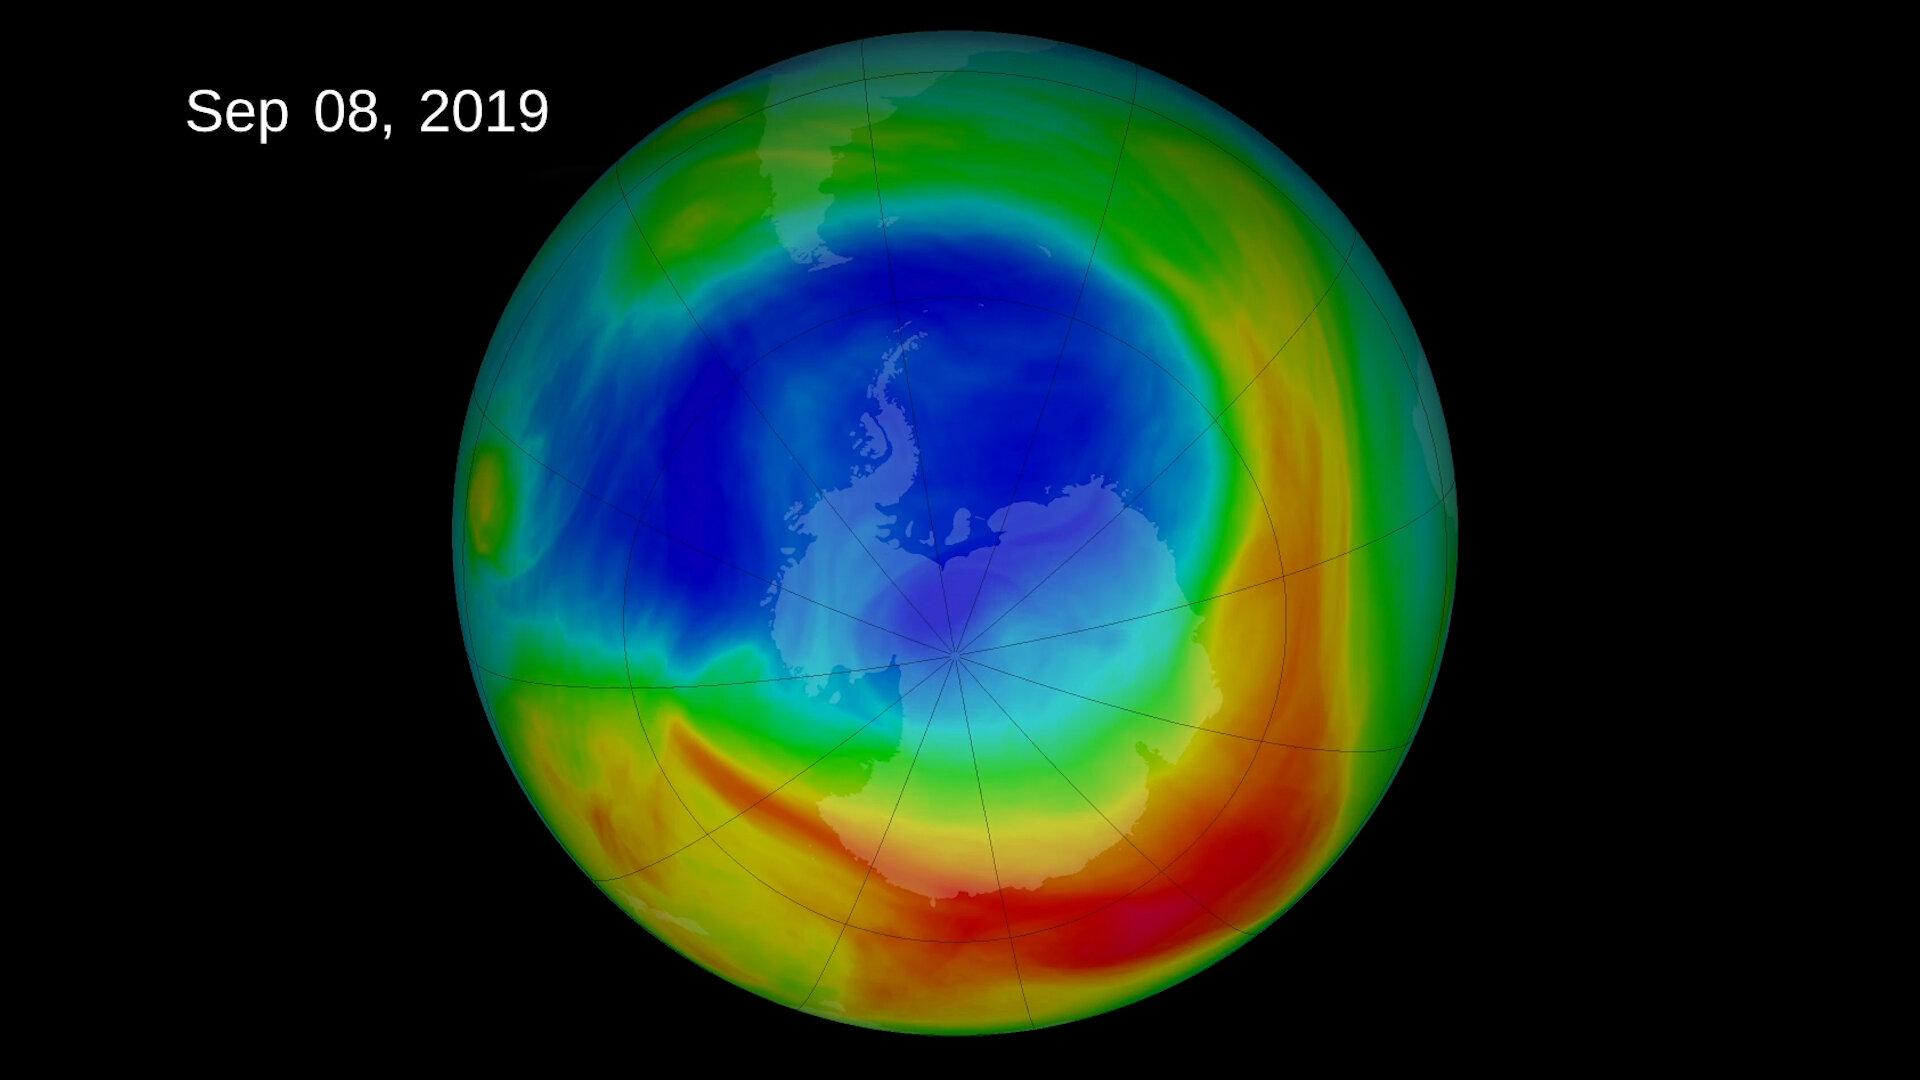 Ozone pollution has increased in Antarctica